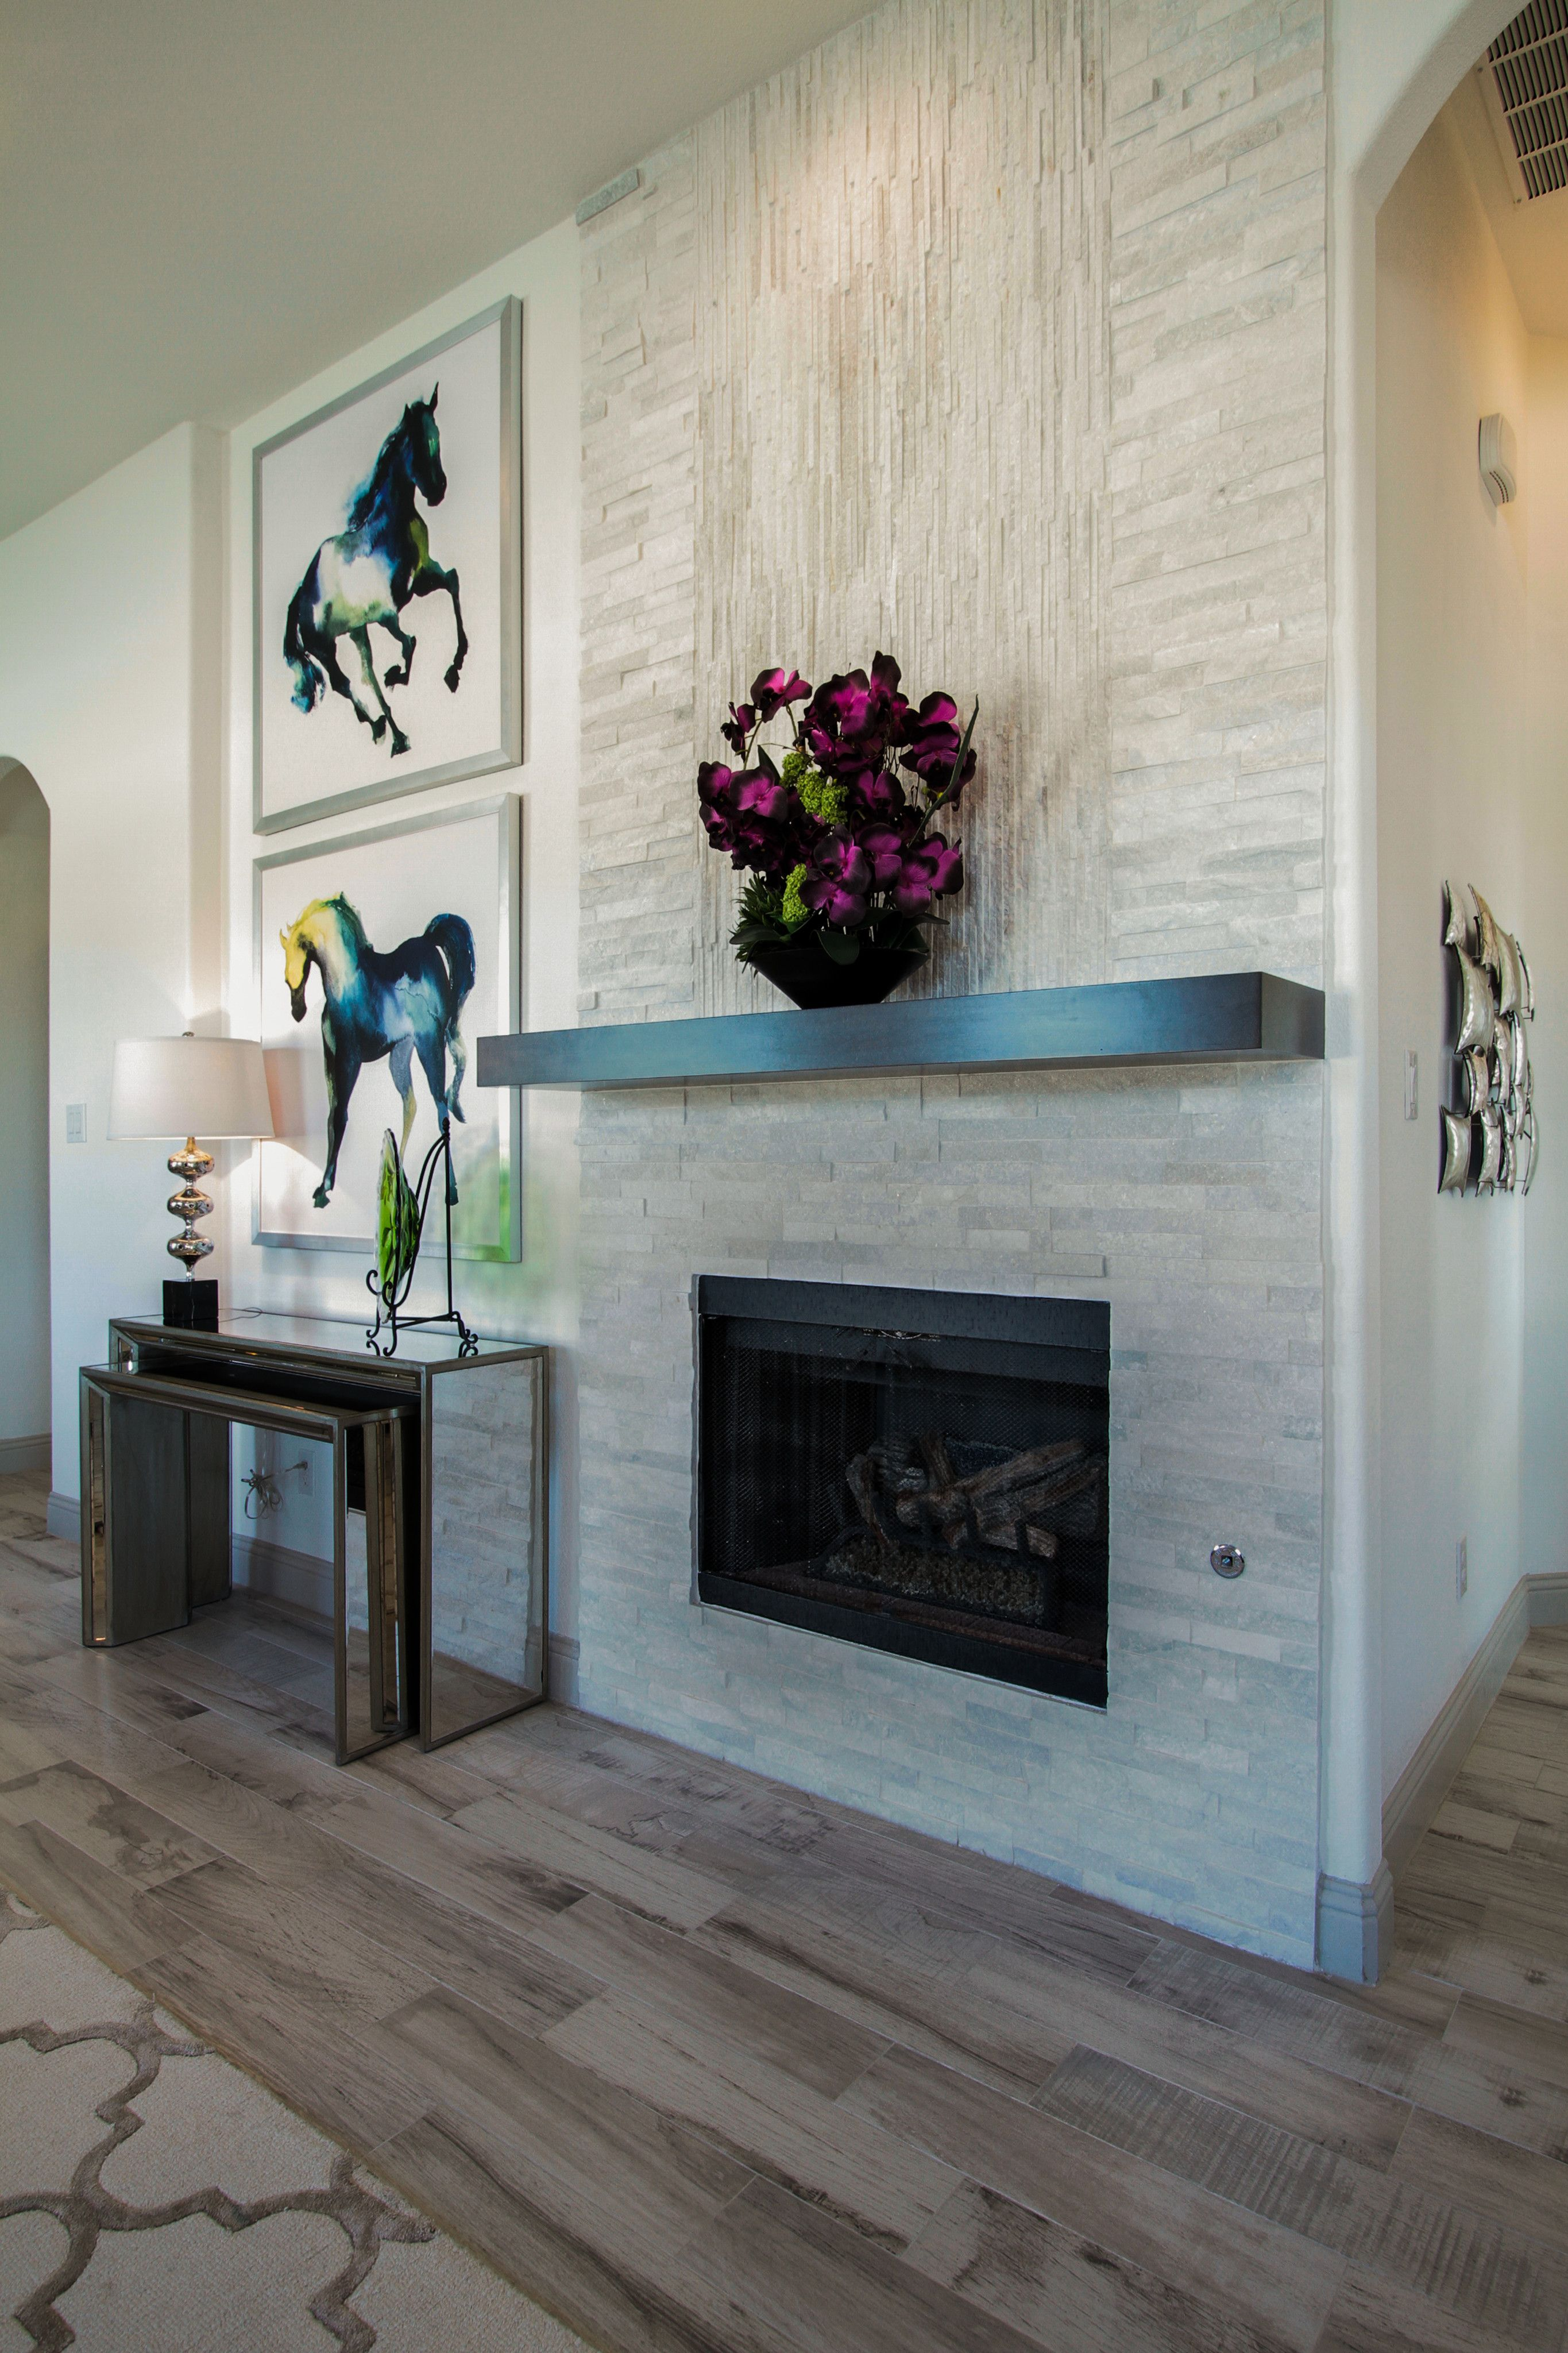 gehan homes princeton fireplace light grey stone fireplace with